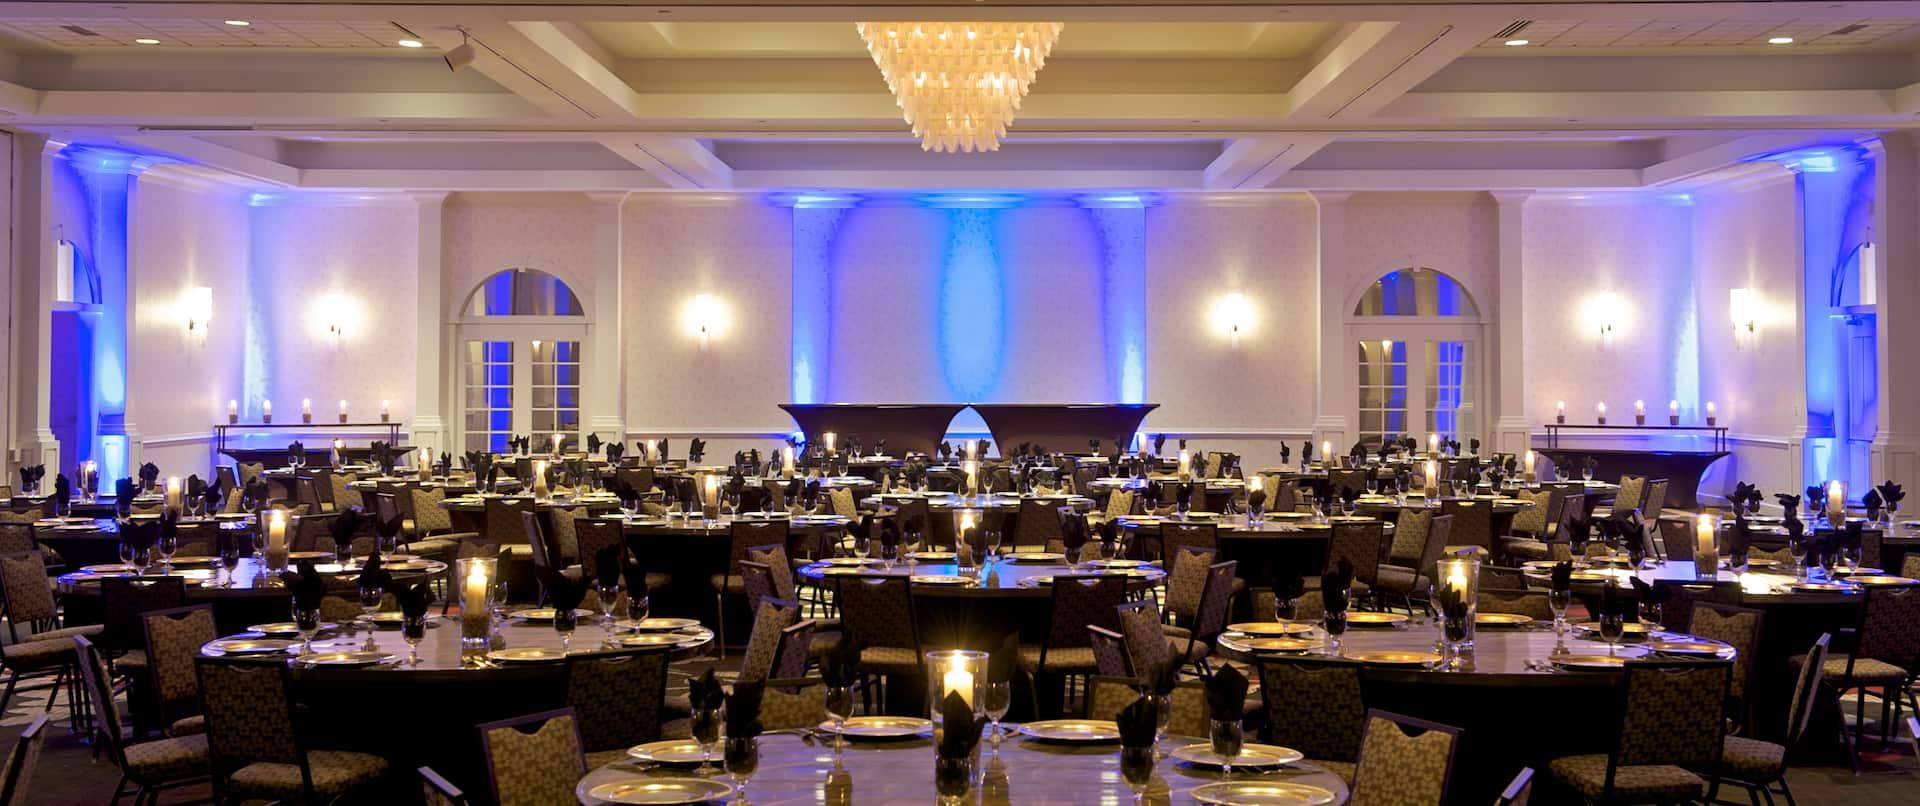 MN Valley Ballroom, Banquet Style